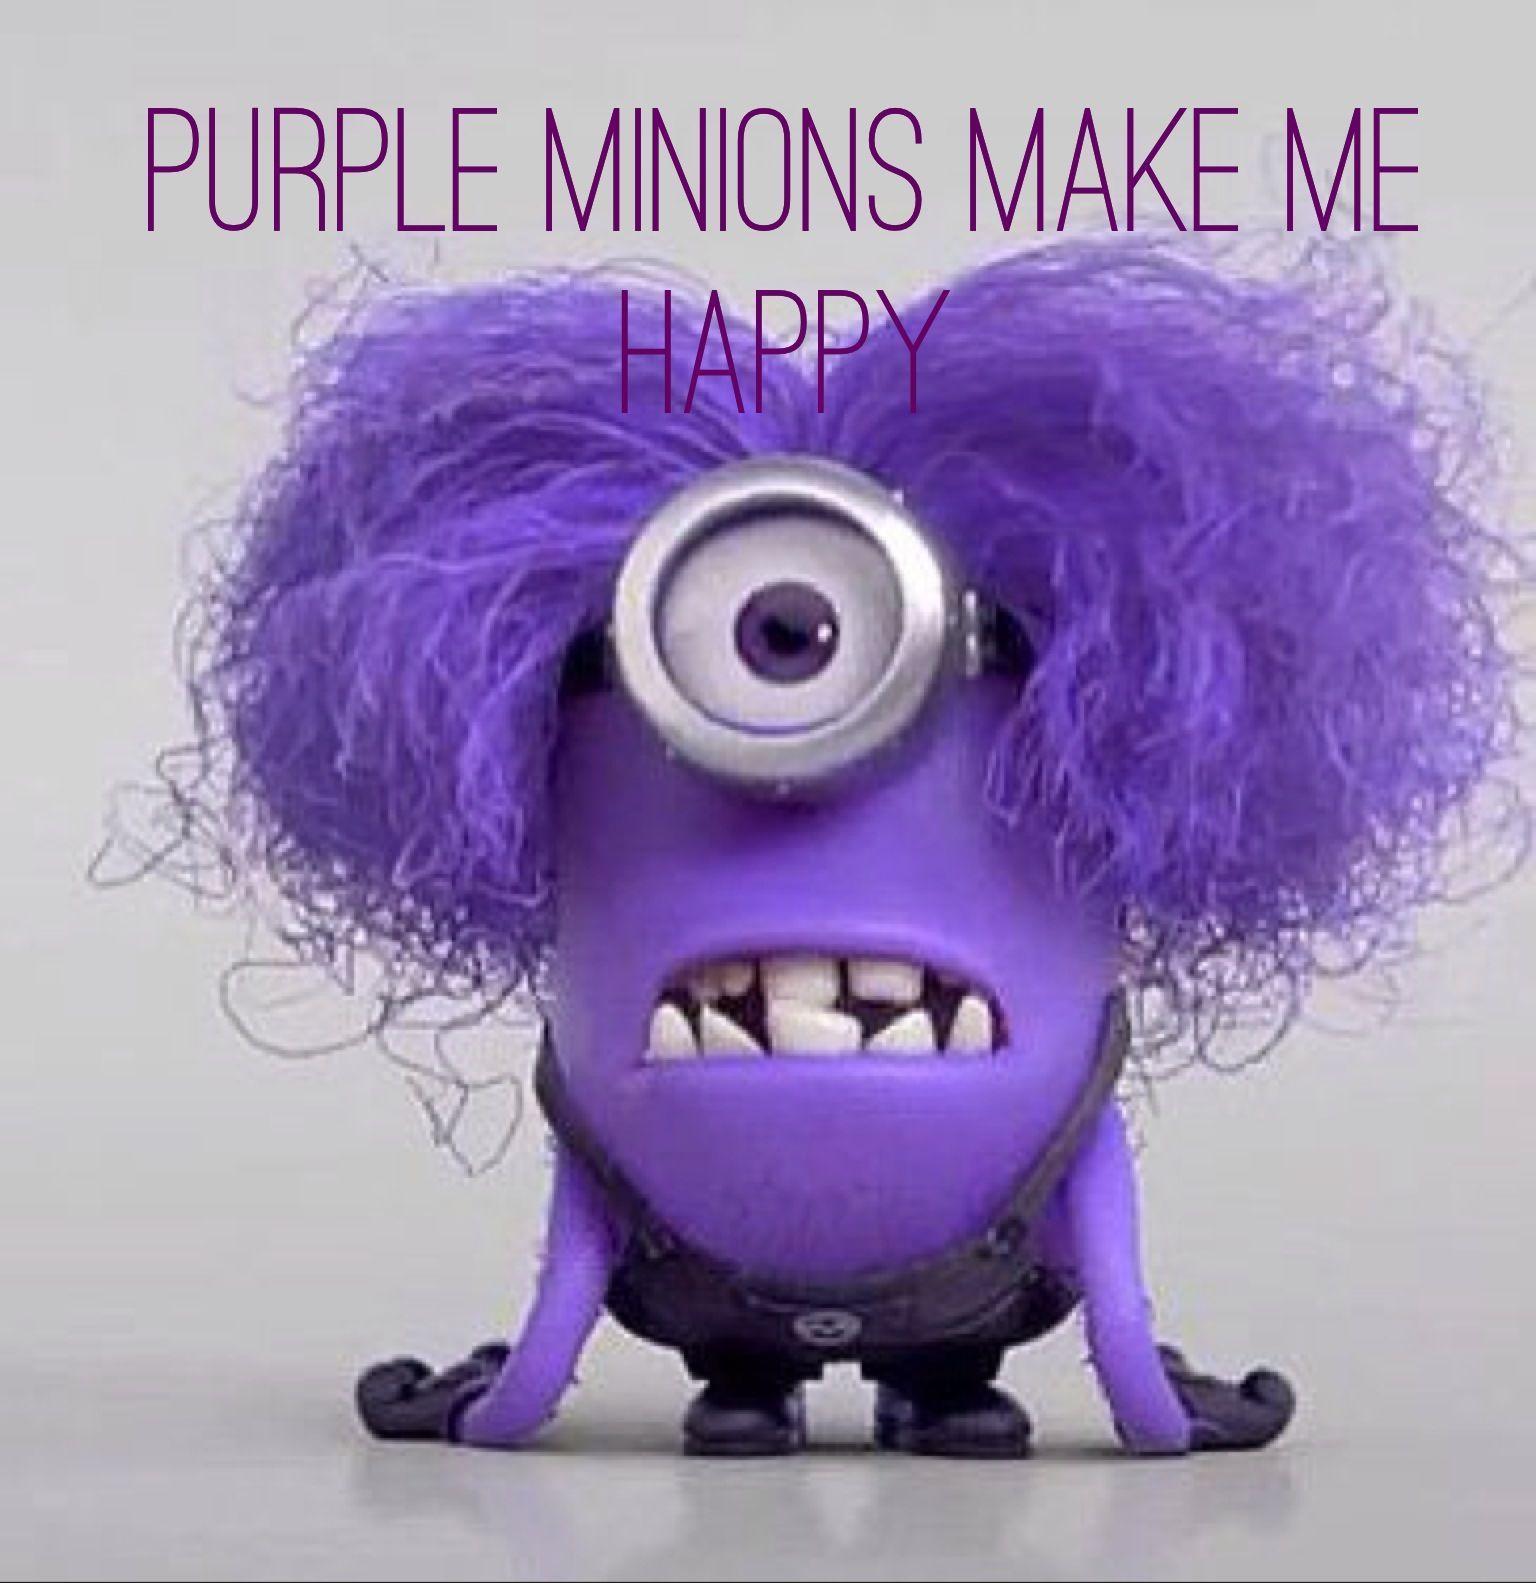 Purple Minion Memes Funny: Purple Minions Make Me Happy